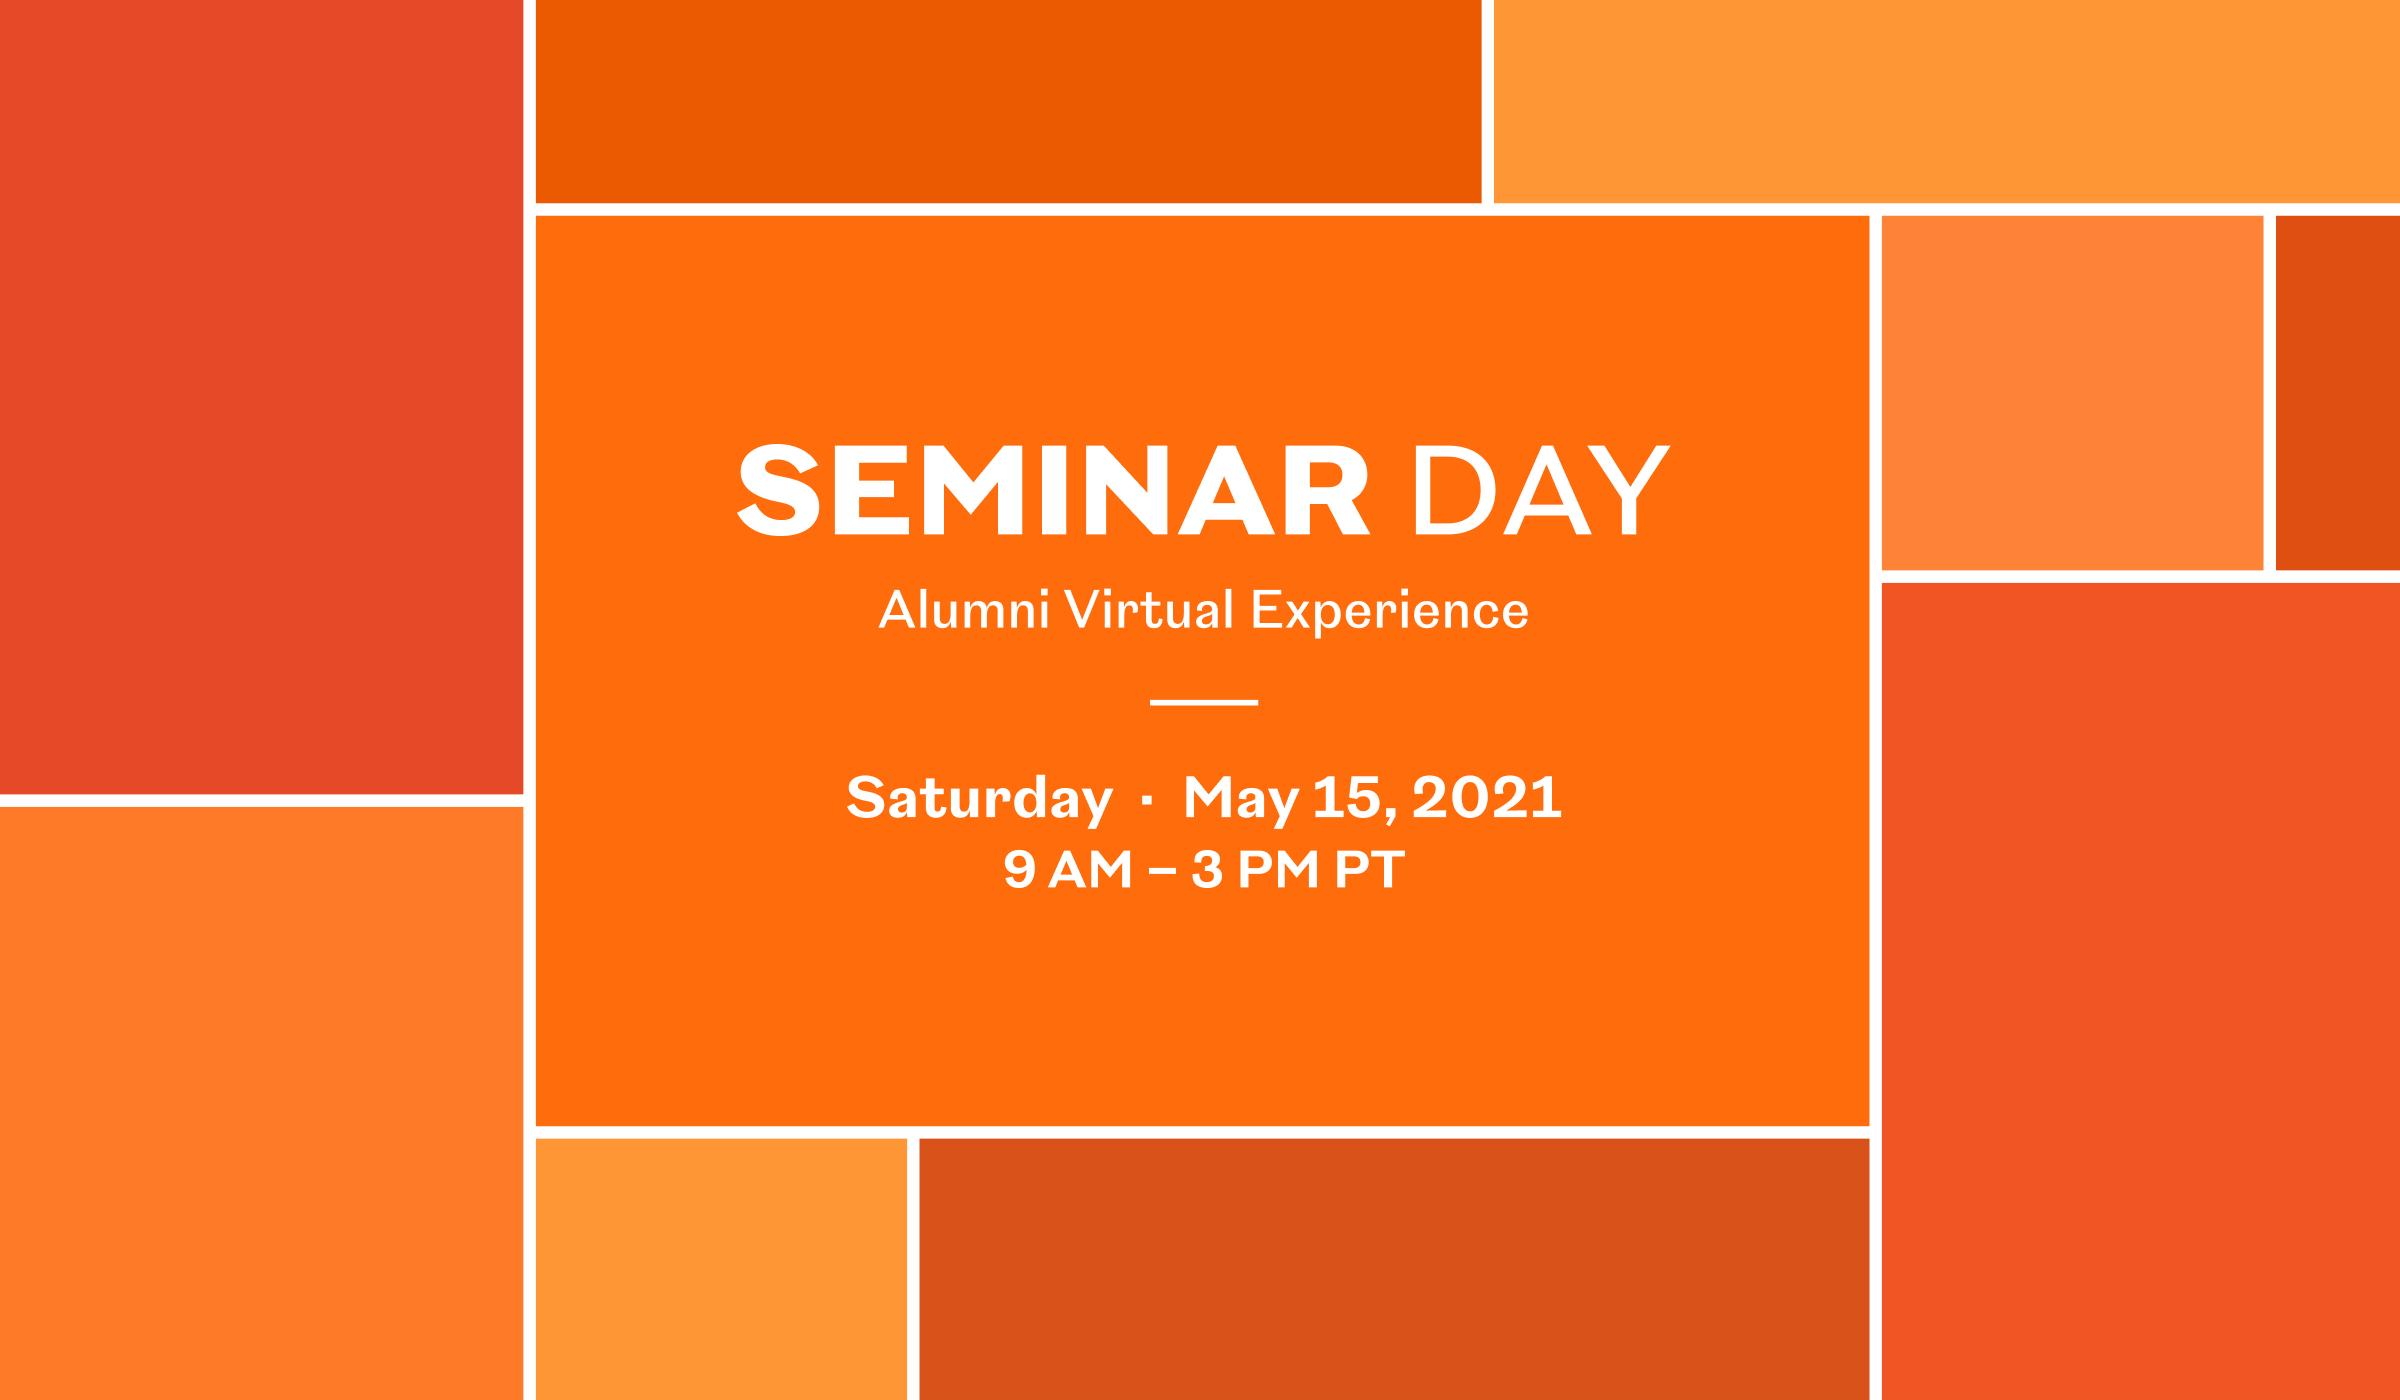 Register Now for Seminar Day 2021